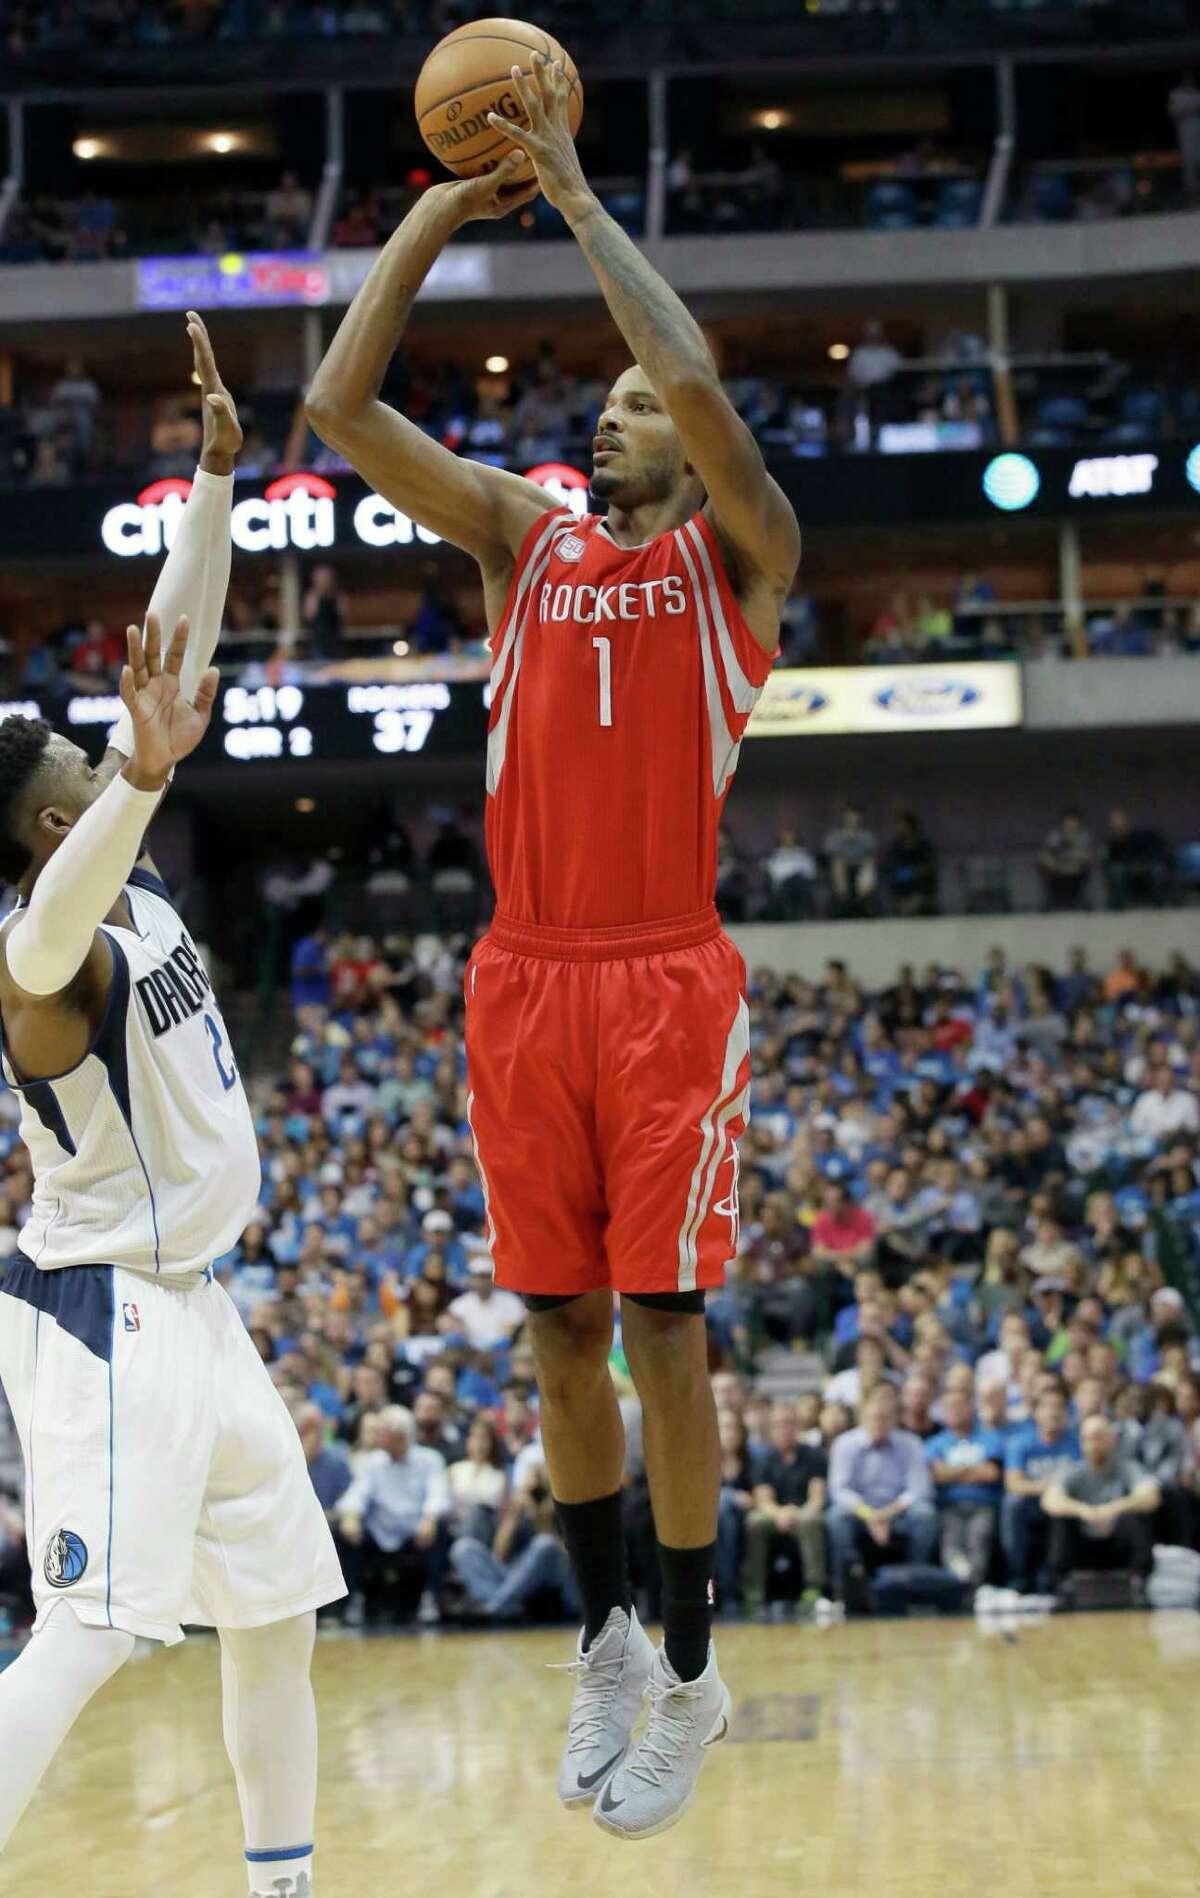 Houston Rockets forward Trevor Ariza (1) shoots over Dallas Mavericks guard Wesley Matthews (23) during the first half of an NBA basketball game in Dallas, Friday, Oct. 28, 2016. (AP Photo/LM Otero)